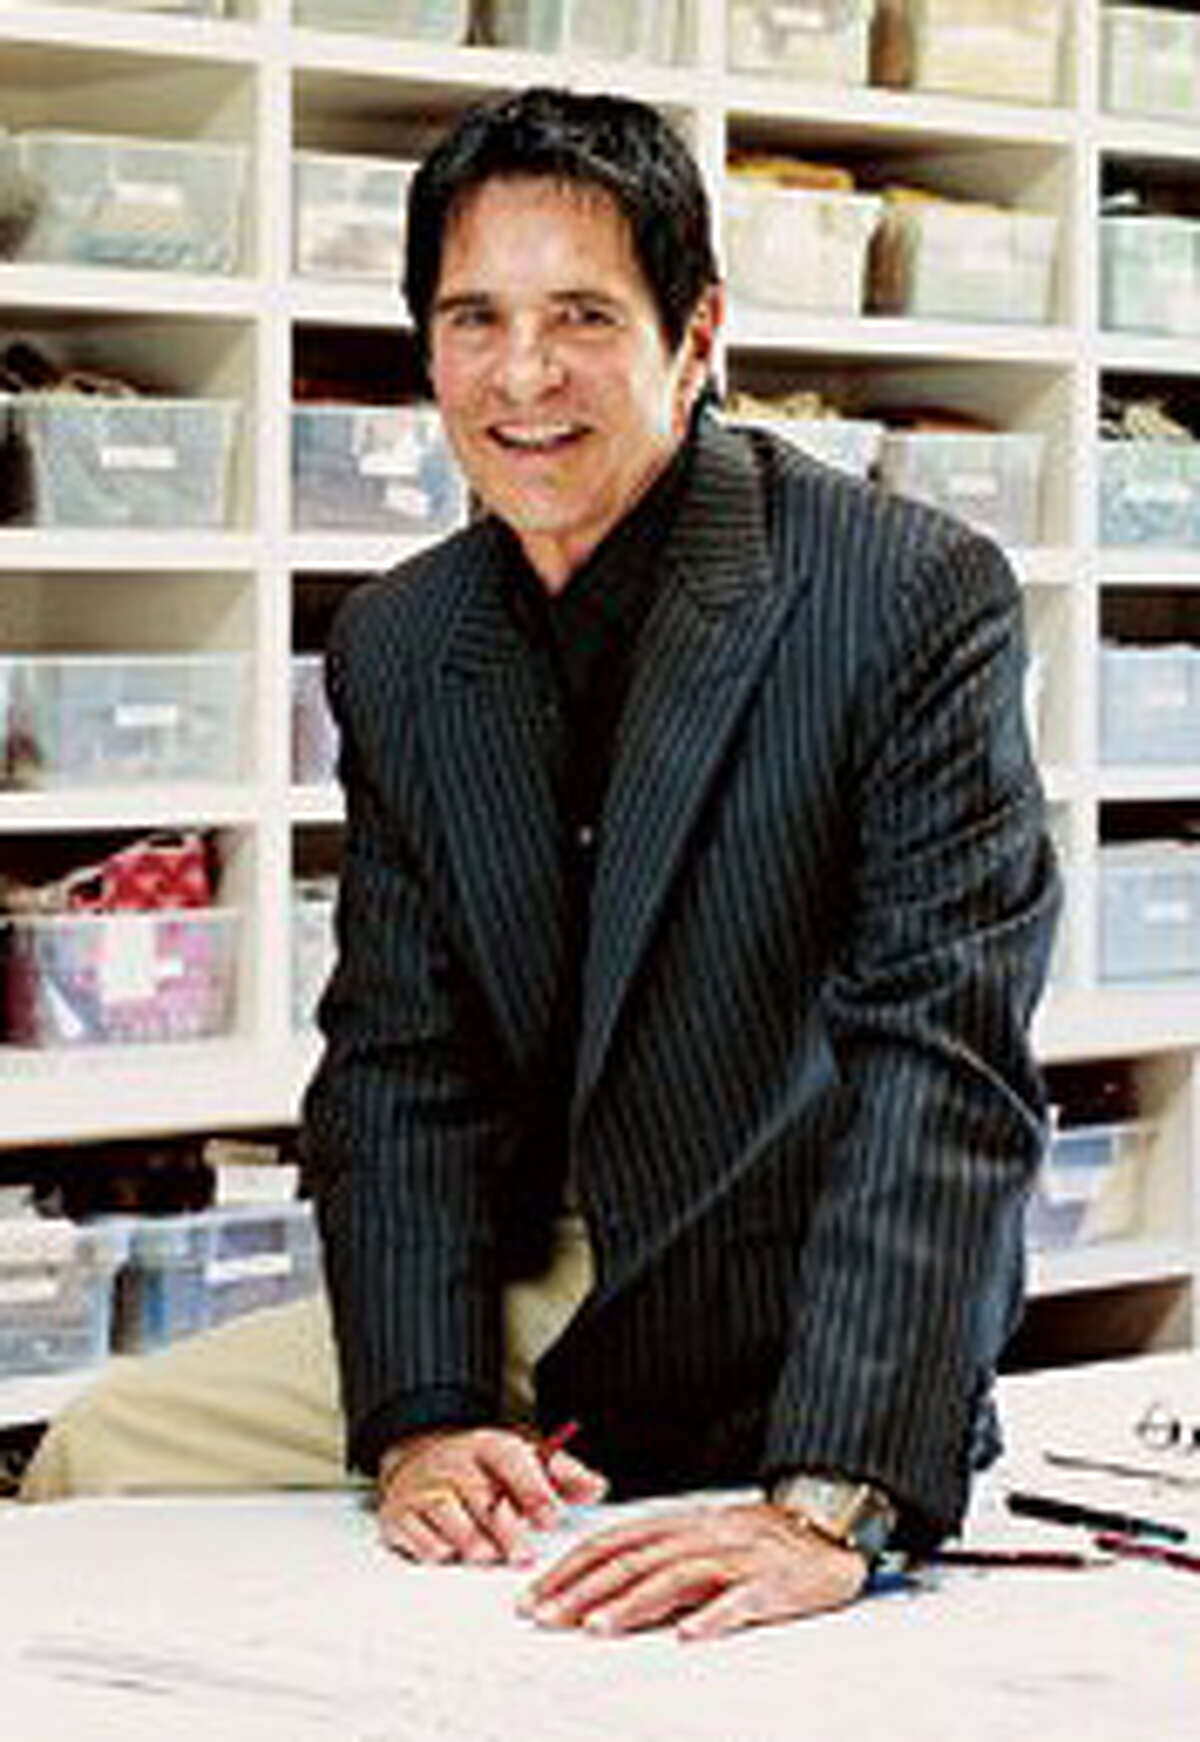 TOM ALLARDYCEInterior Designer Earned BBA in Marketing in 1971 from Lamar.